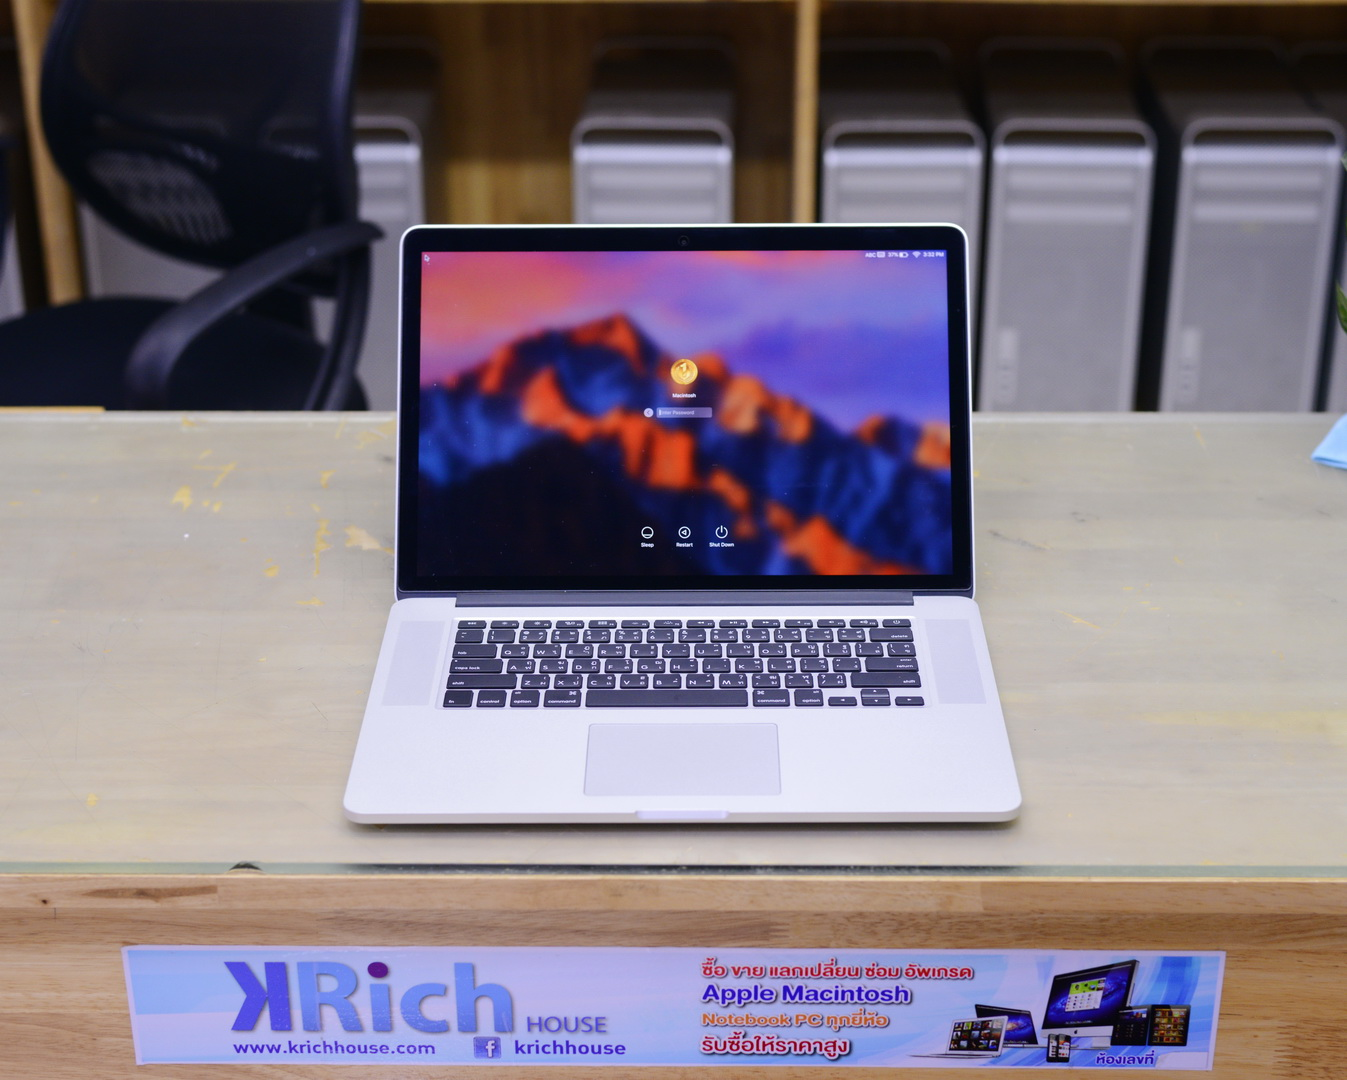 MacBook Pro (15-inch, Mid 2015) - Quad-Core i7 2.2GHz RAM 16GB SSD 256GB